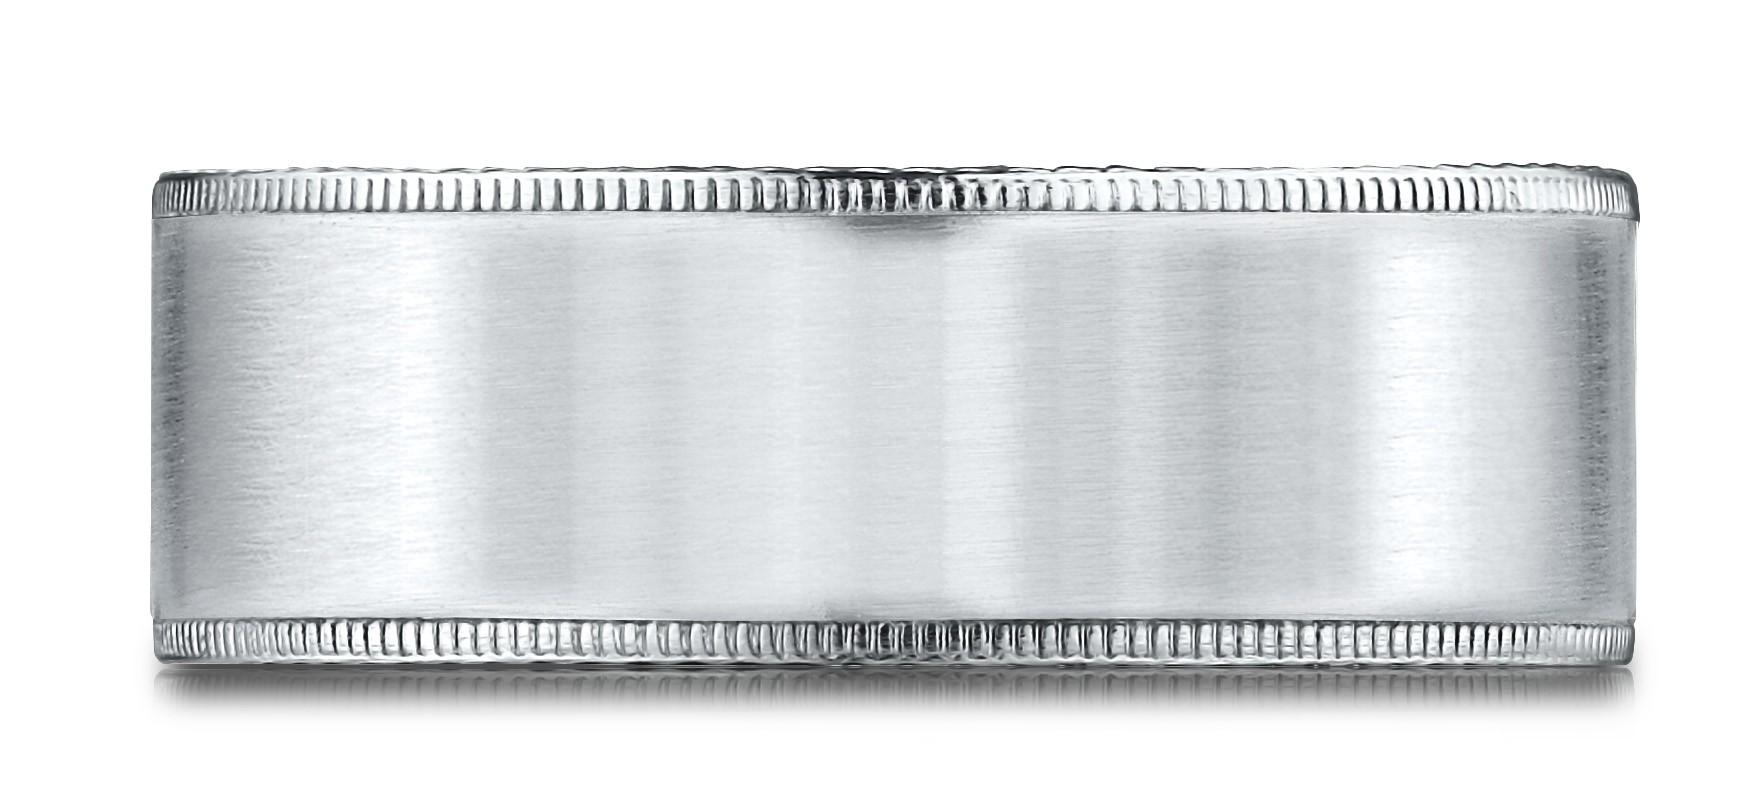 14k White Gold 8mm Comfort-fit Riveted Edge Satin Finish Design Band